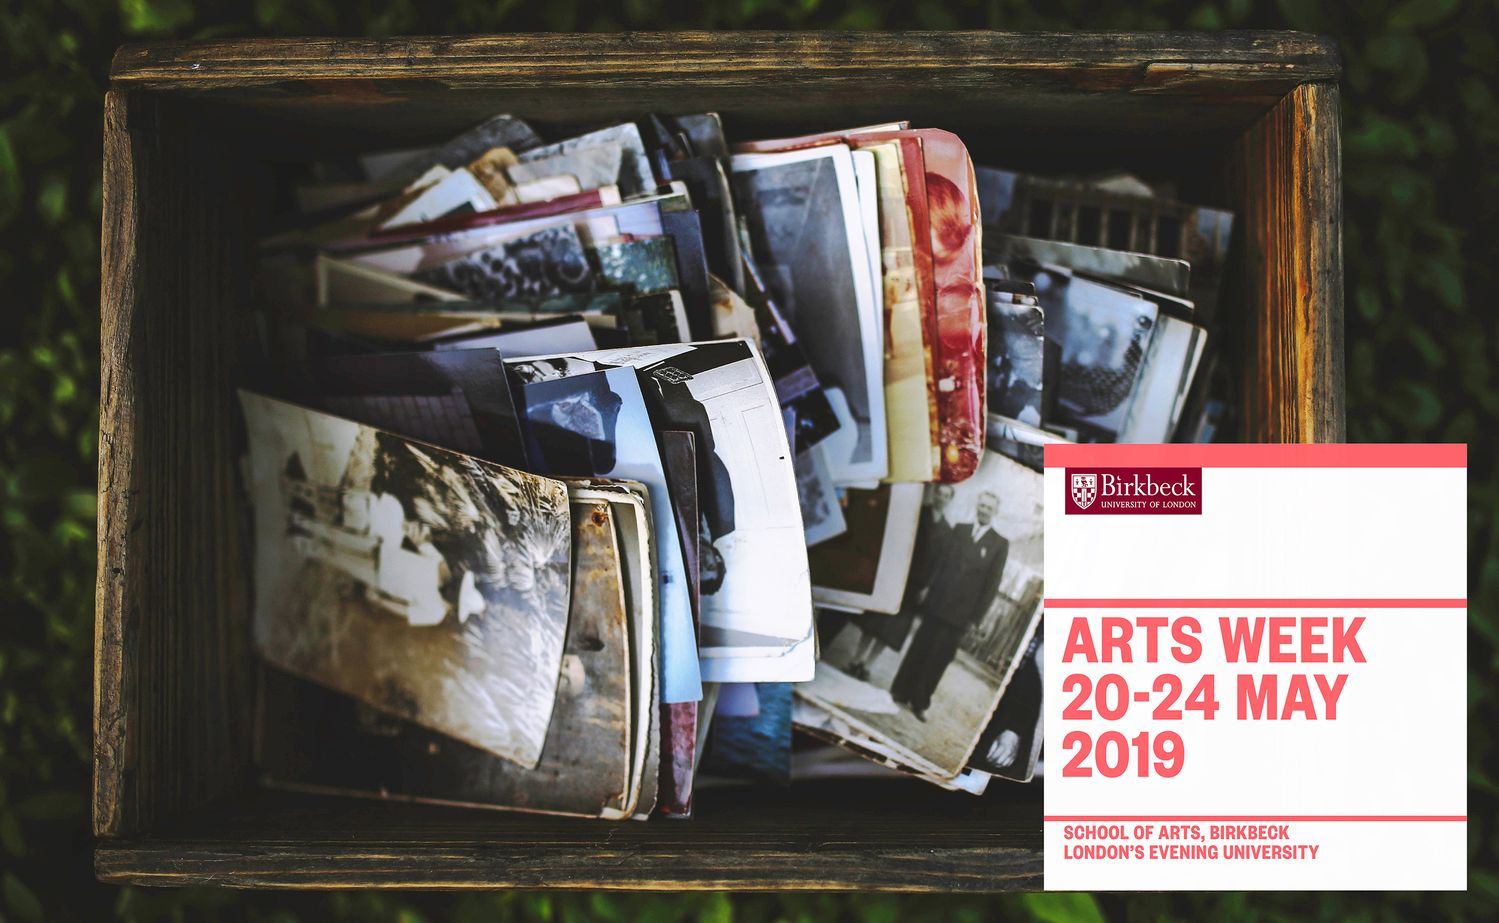 Arts Week 2019 - Art Fair at Birkbeck, School of Arts in London